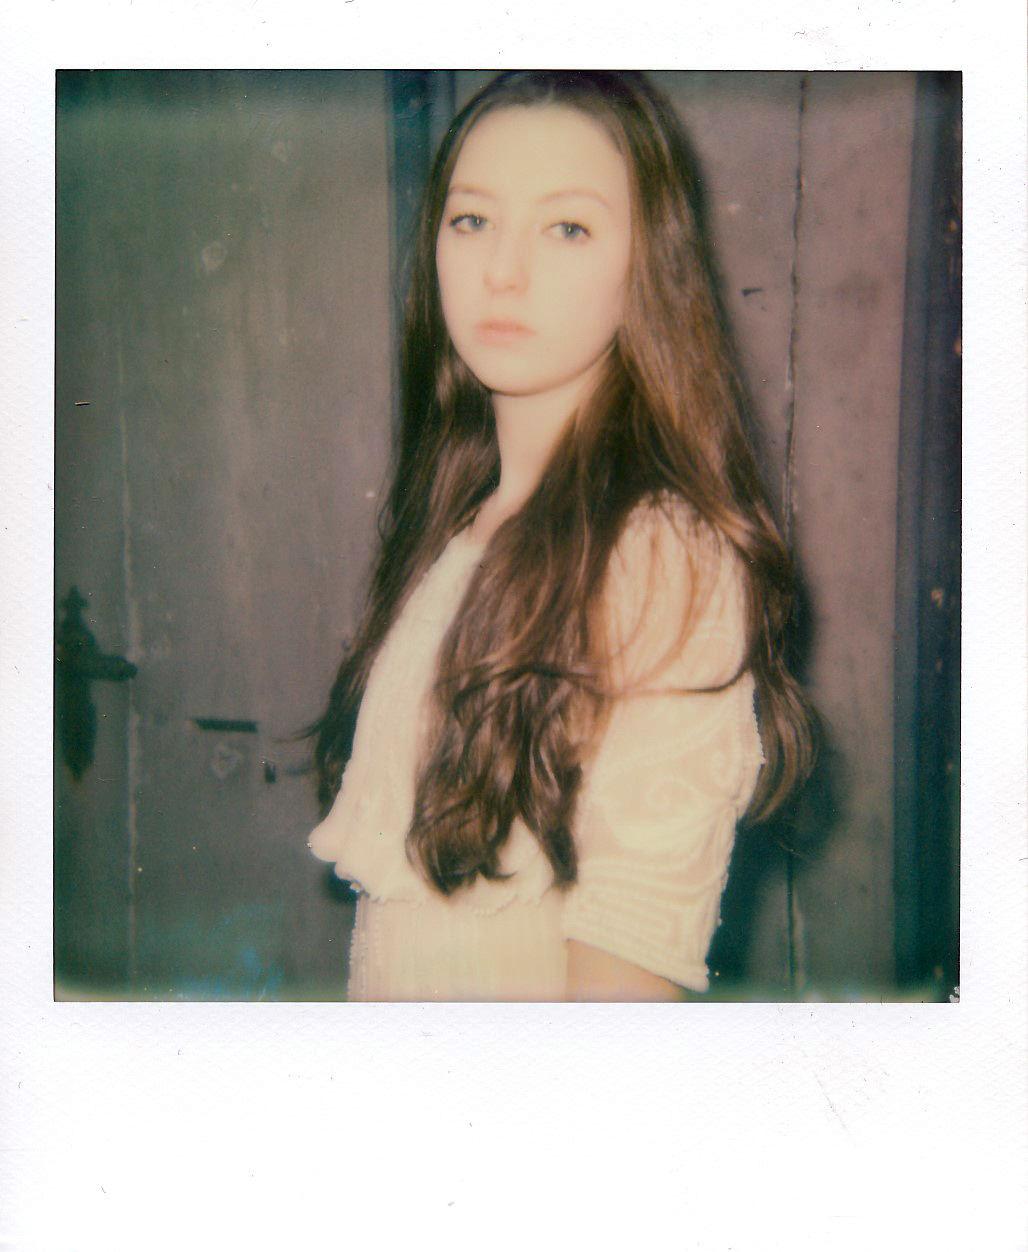 Portrait Diaries II (c) Lomoherz